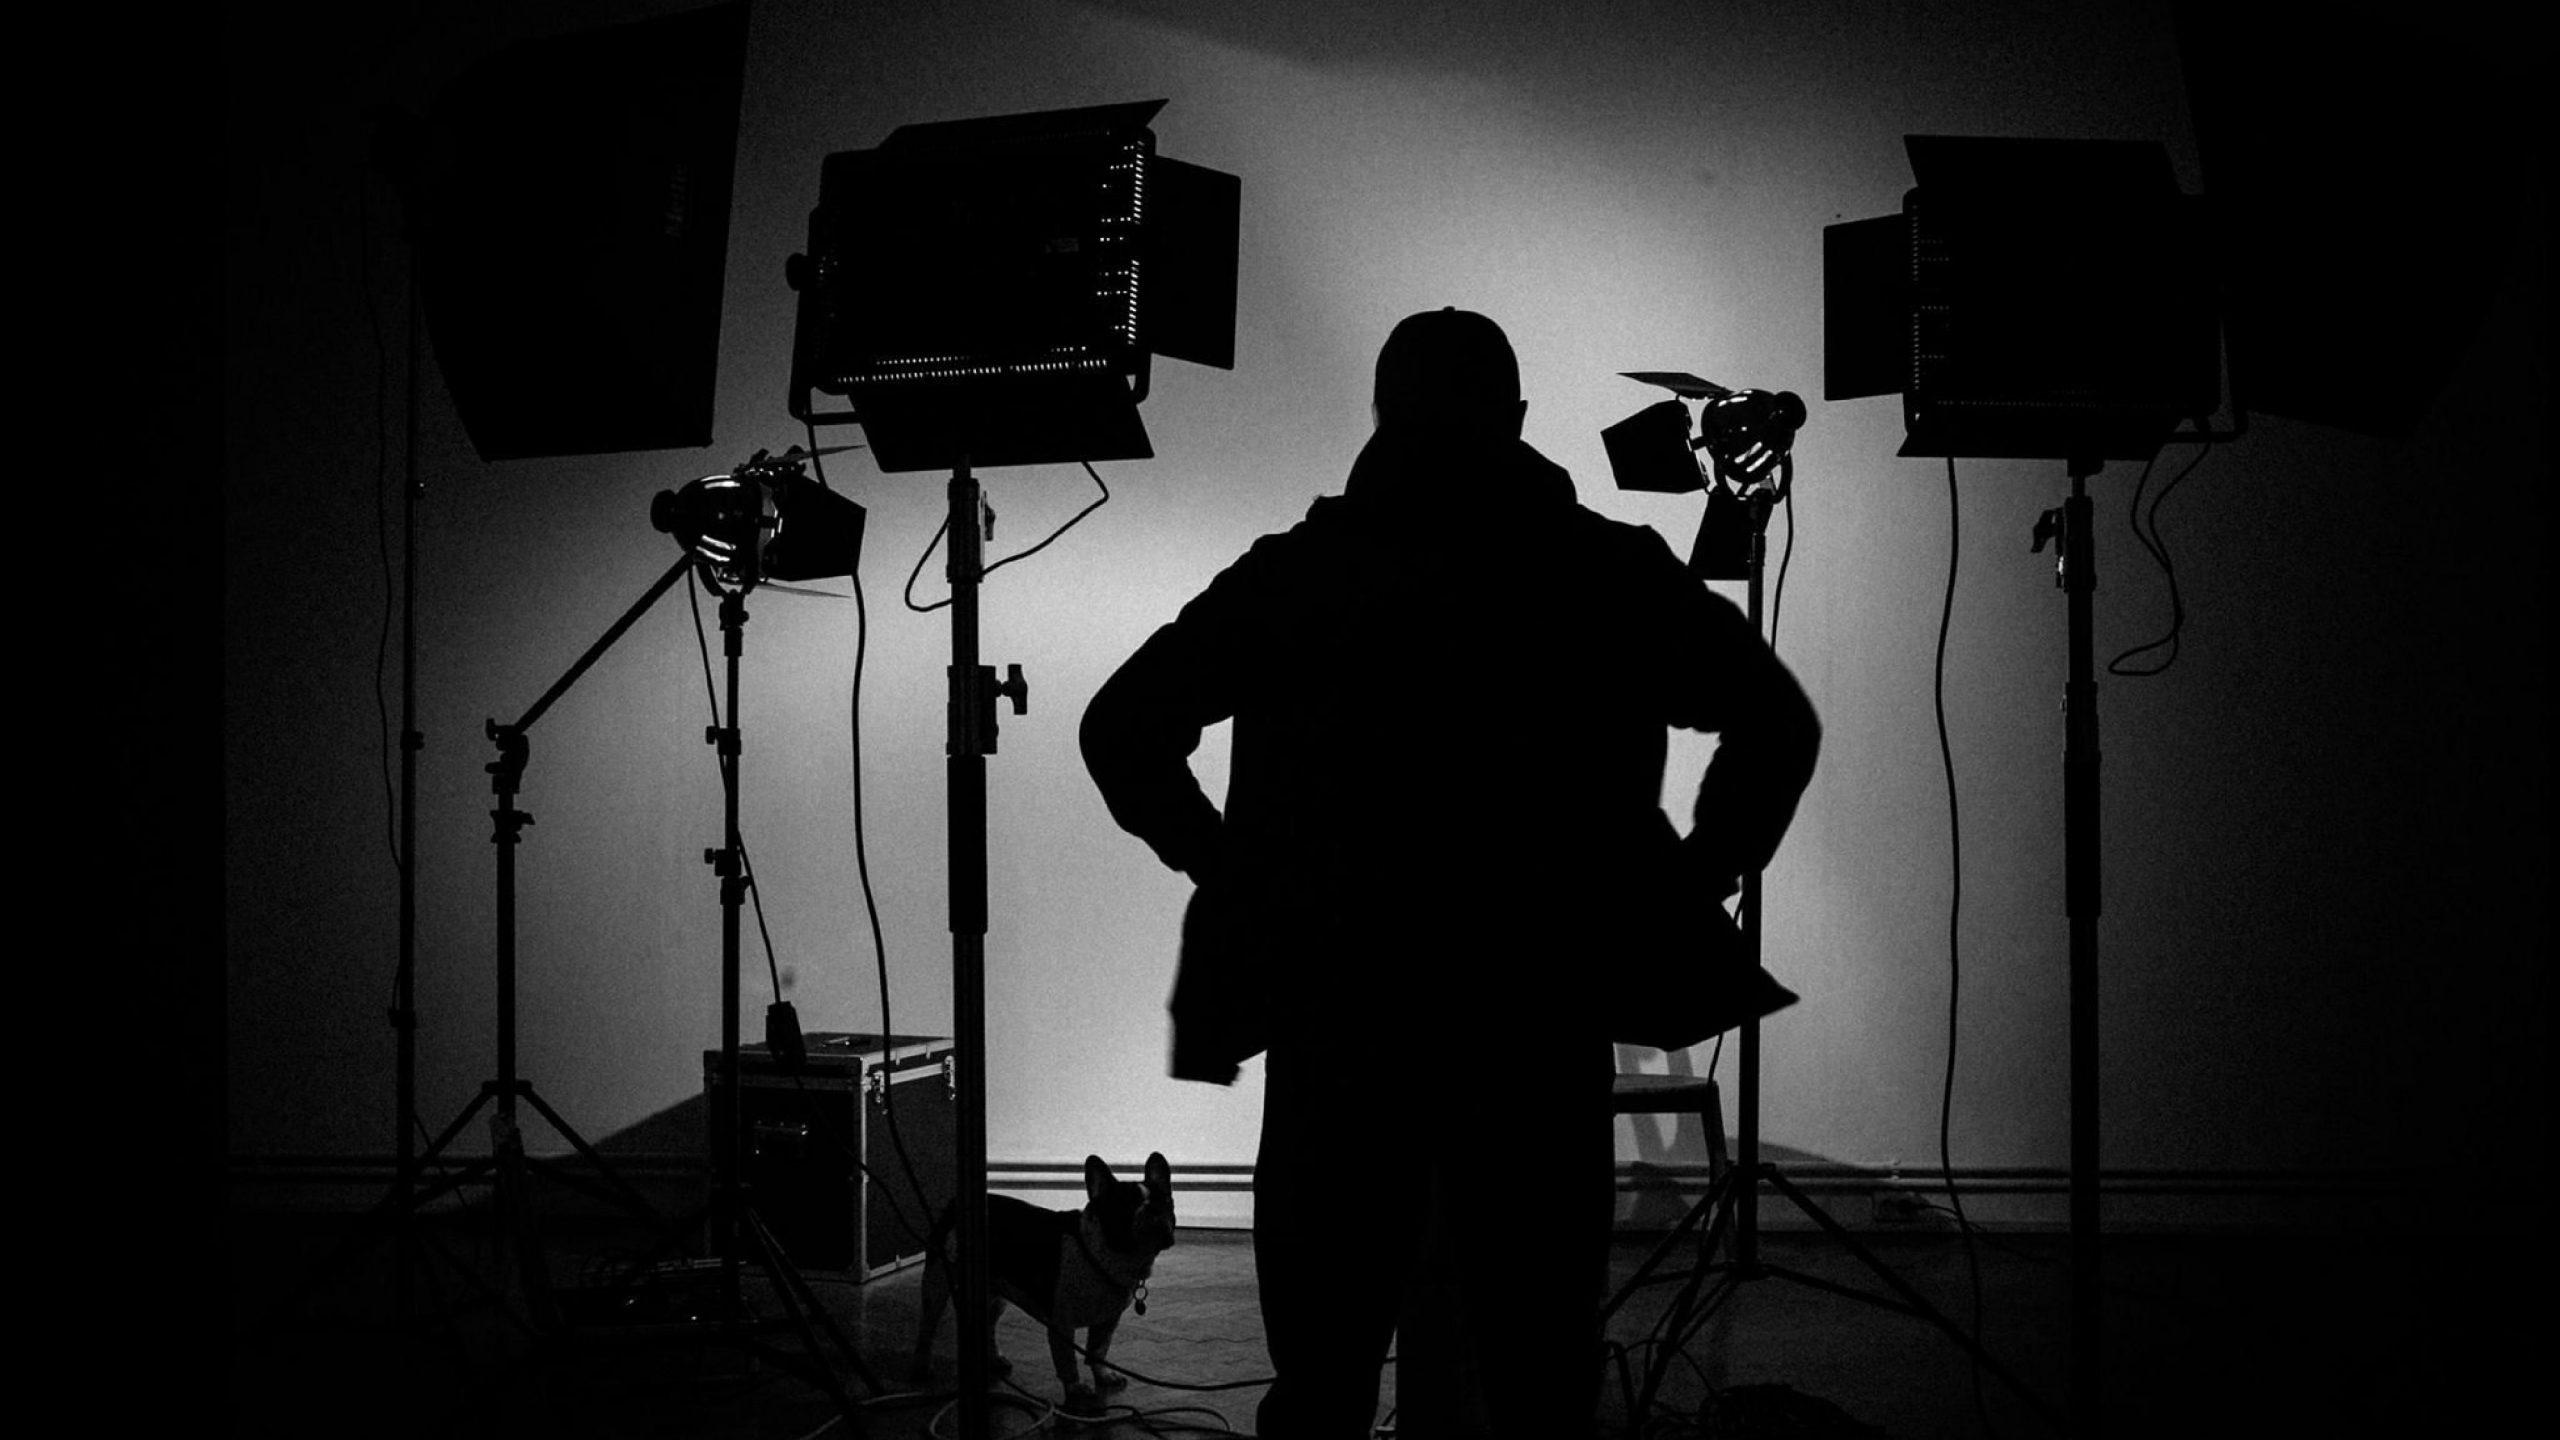 Why Film Production - Why Company_Tavola disegno 1